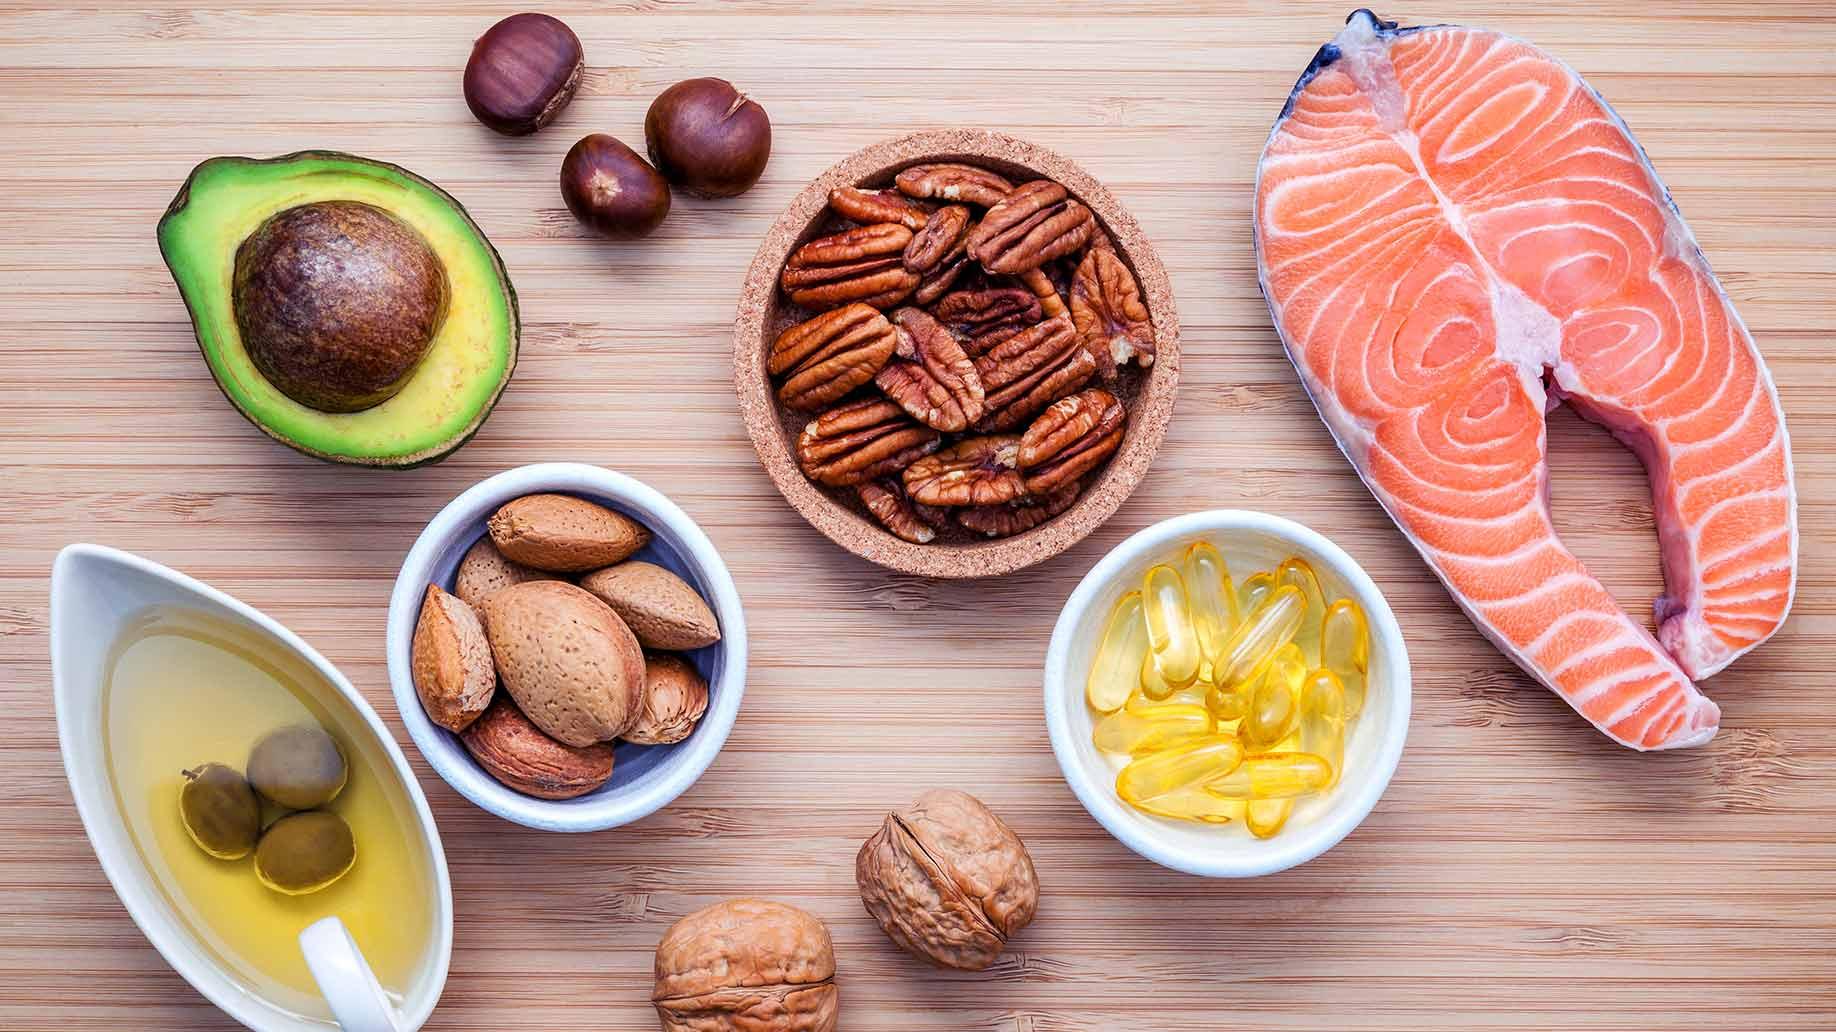 dha omega 3 fatty acid walnuts salmon chestnut avocado memory loss natural remedies